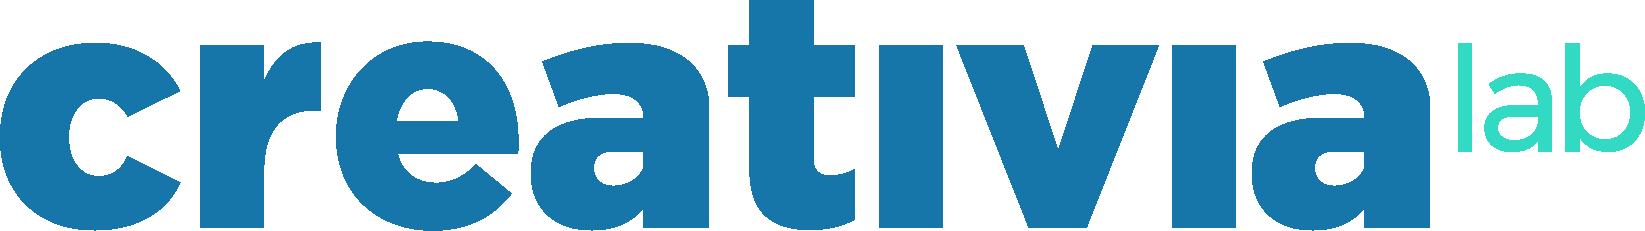 Fotografia Creativialab logo